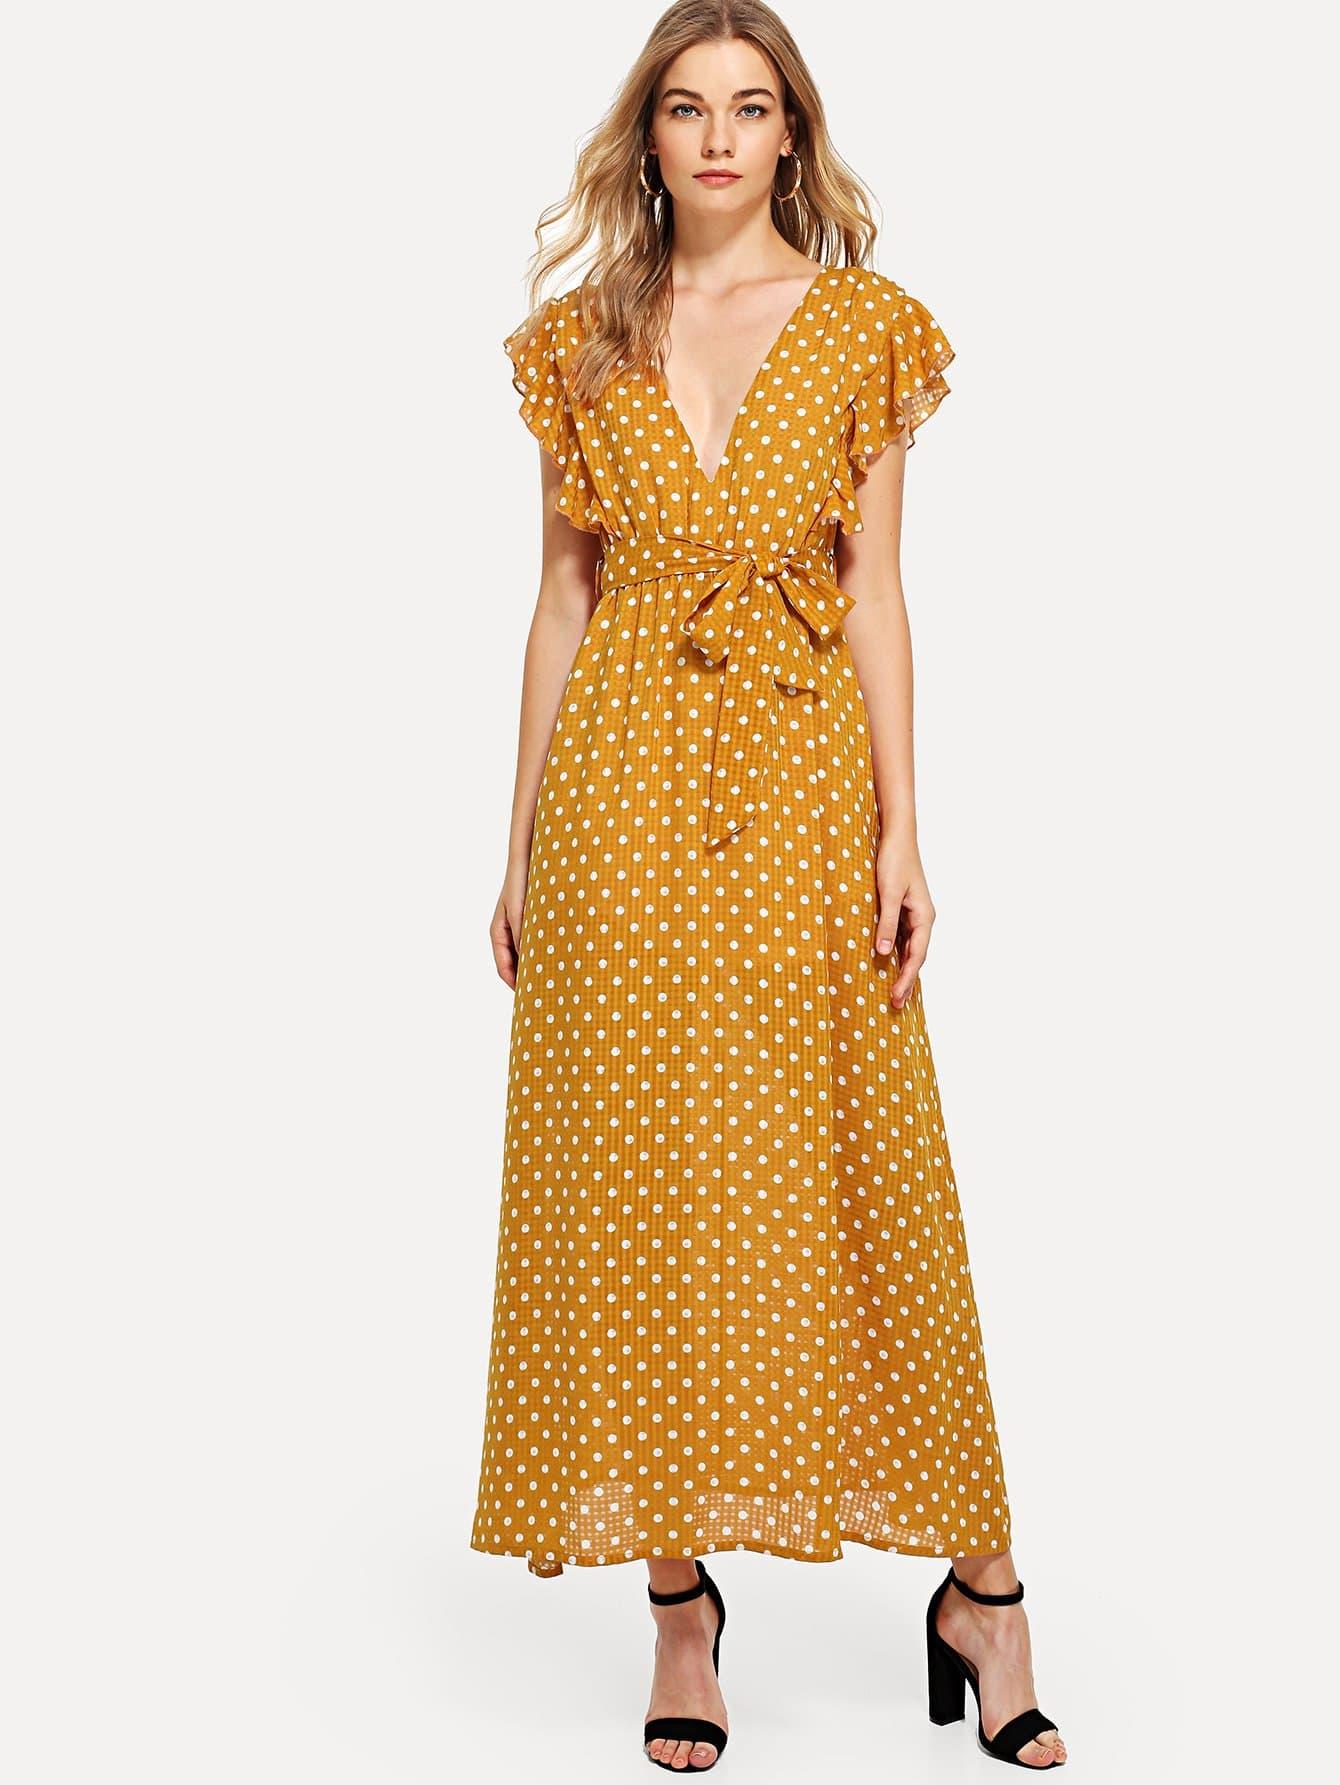 Ruffle Trim Belted Polka Dot Dress ruffle trim belted polka dot dress